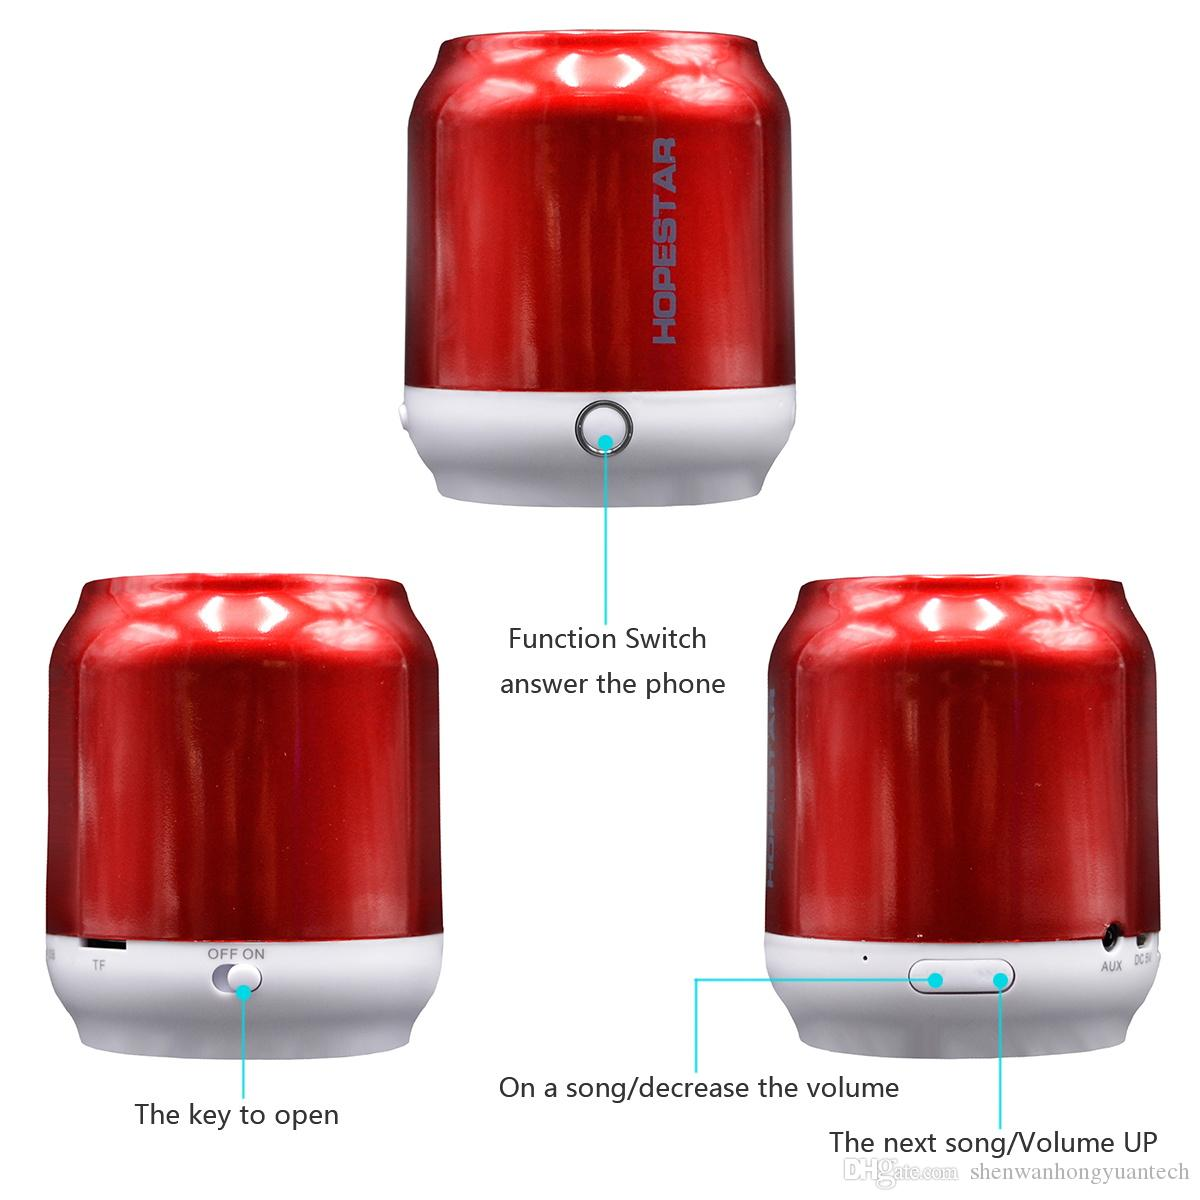 Hopestar H8 H9 Stereo Bluetooth Mini Speaker Portable Wireless Speakers Hi-Fi MP3 Loudspeaker Car Handsfree MIC Audio Player Support TF USB